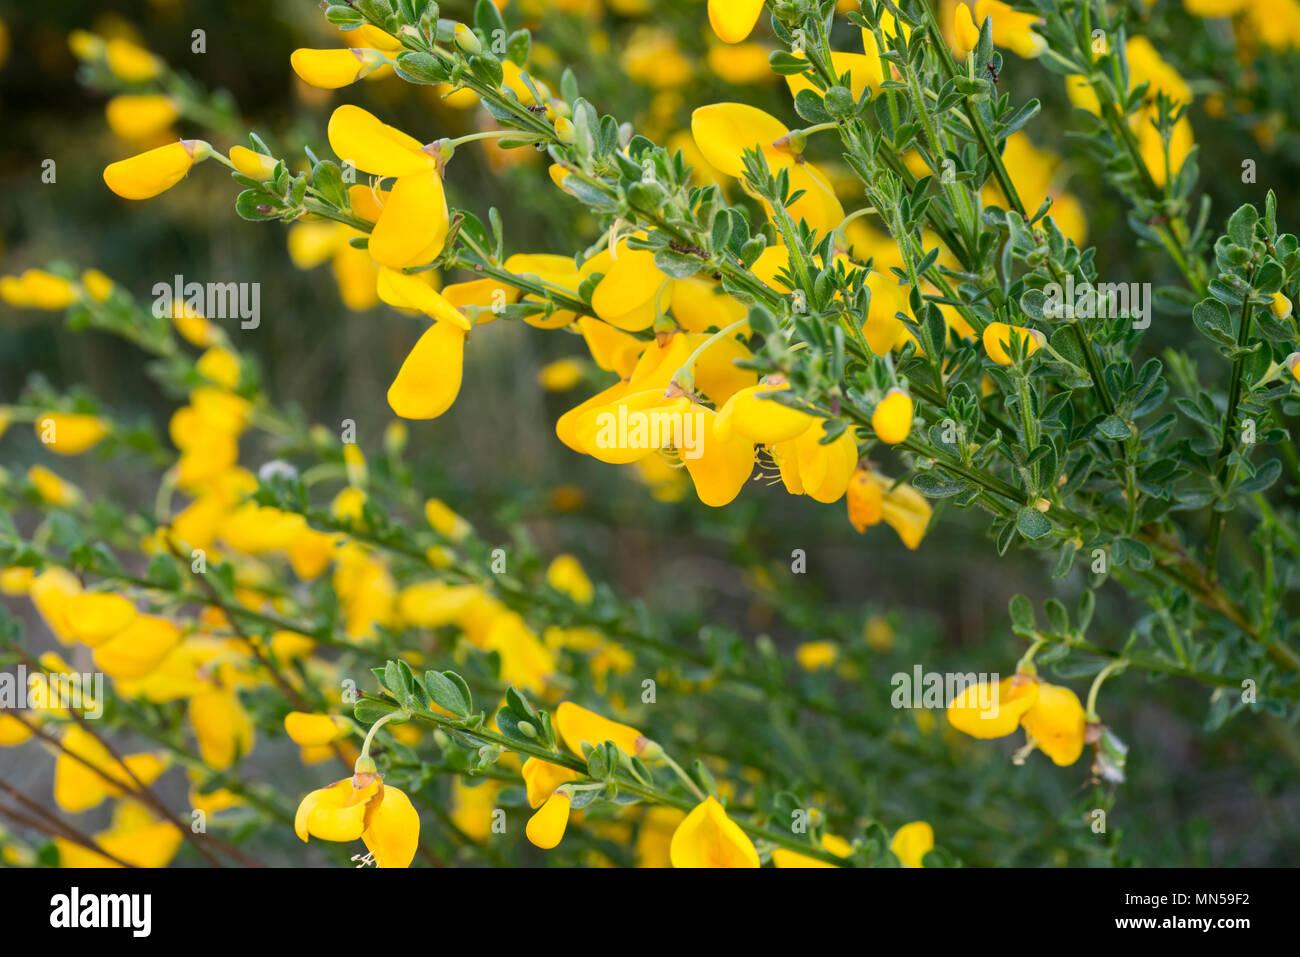 Cytisus scoparius common broom or scotch broom yellow flowers cytisus scoparius common broom or scotch broom yellow flowers closeup selective focus mightylinksfo